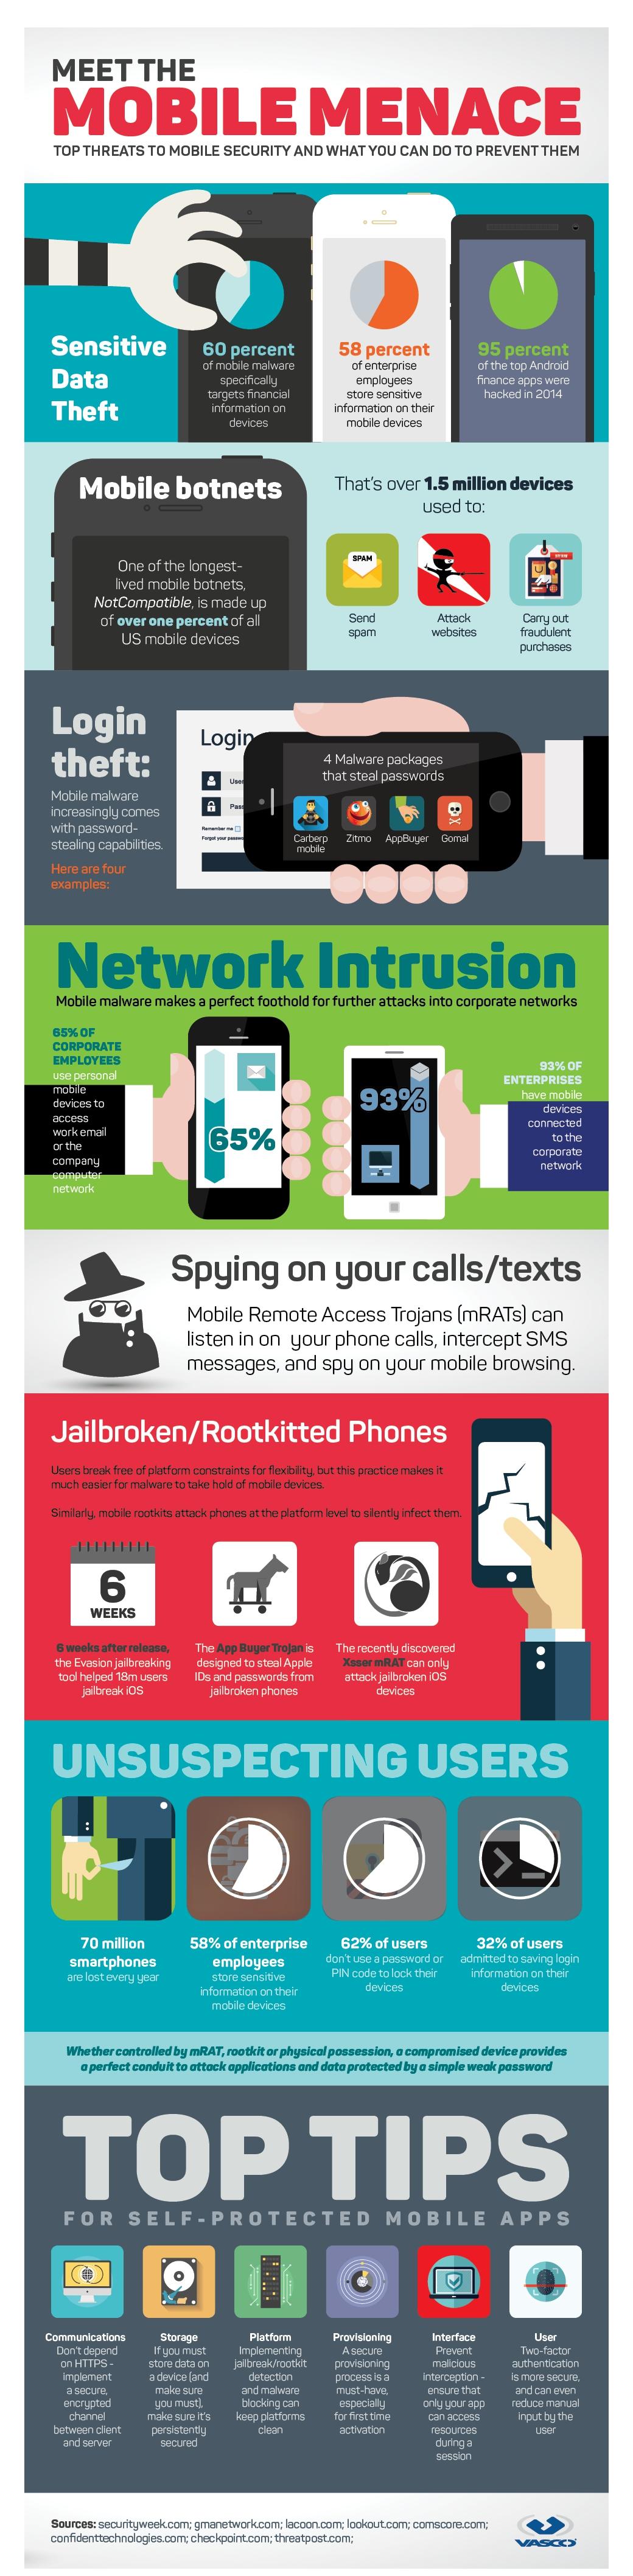 infografia-amenazas-seguridad-movil